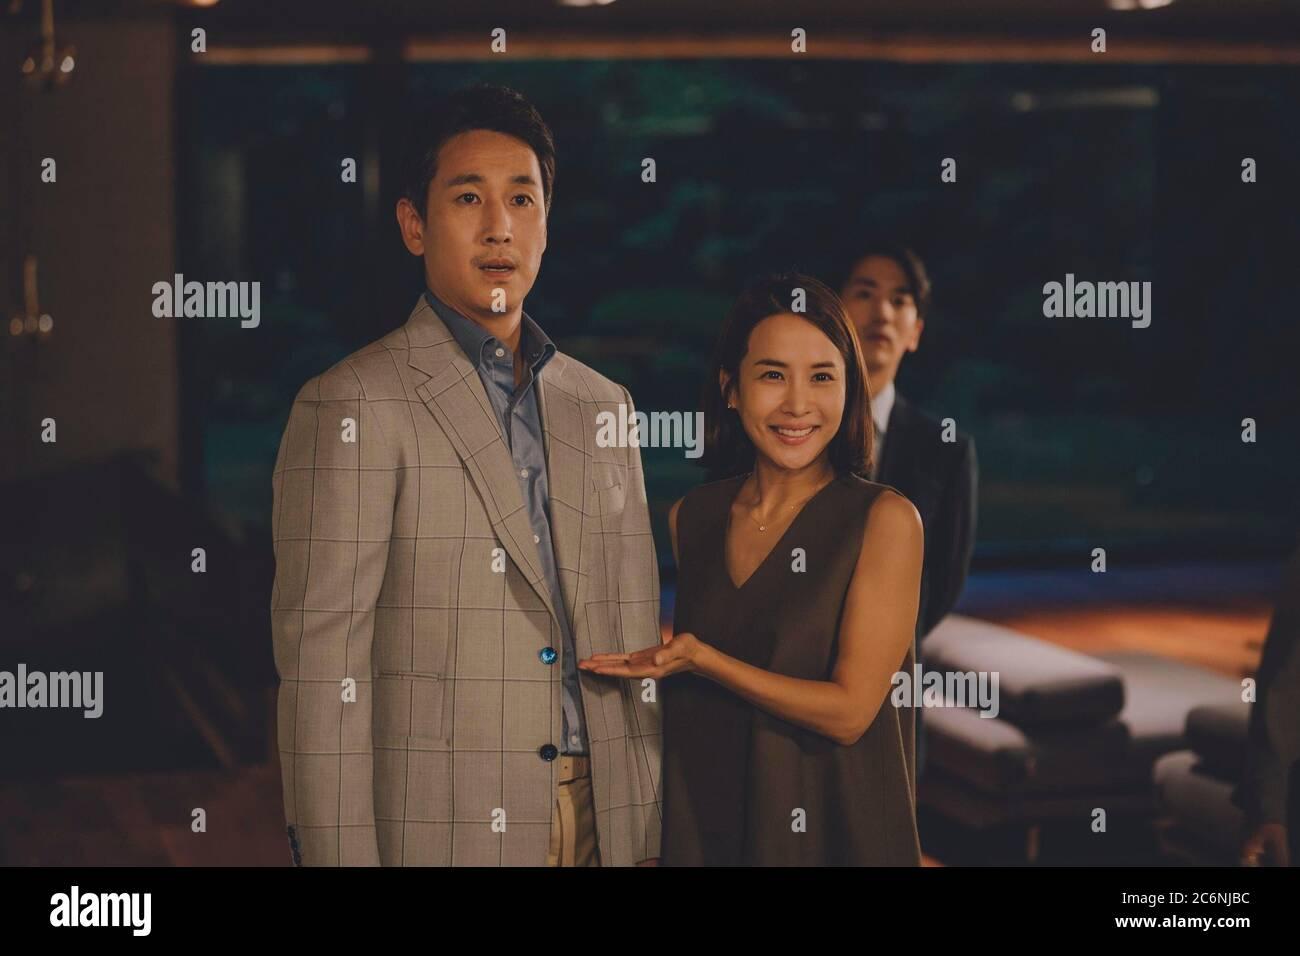 Sun Kyun Lee And Yeo Jeong Jo In Parasite 2019 Original Title Gisaengchung Directed By Joon Ho Bong Credit Cj Entertainment Album Stock Photo Alamy